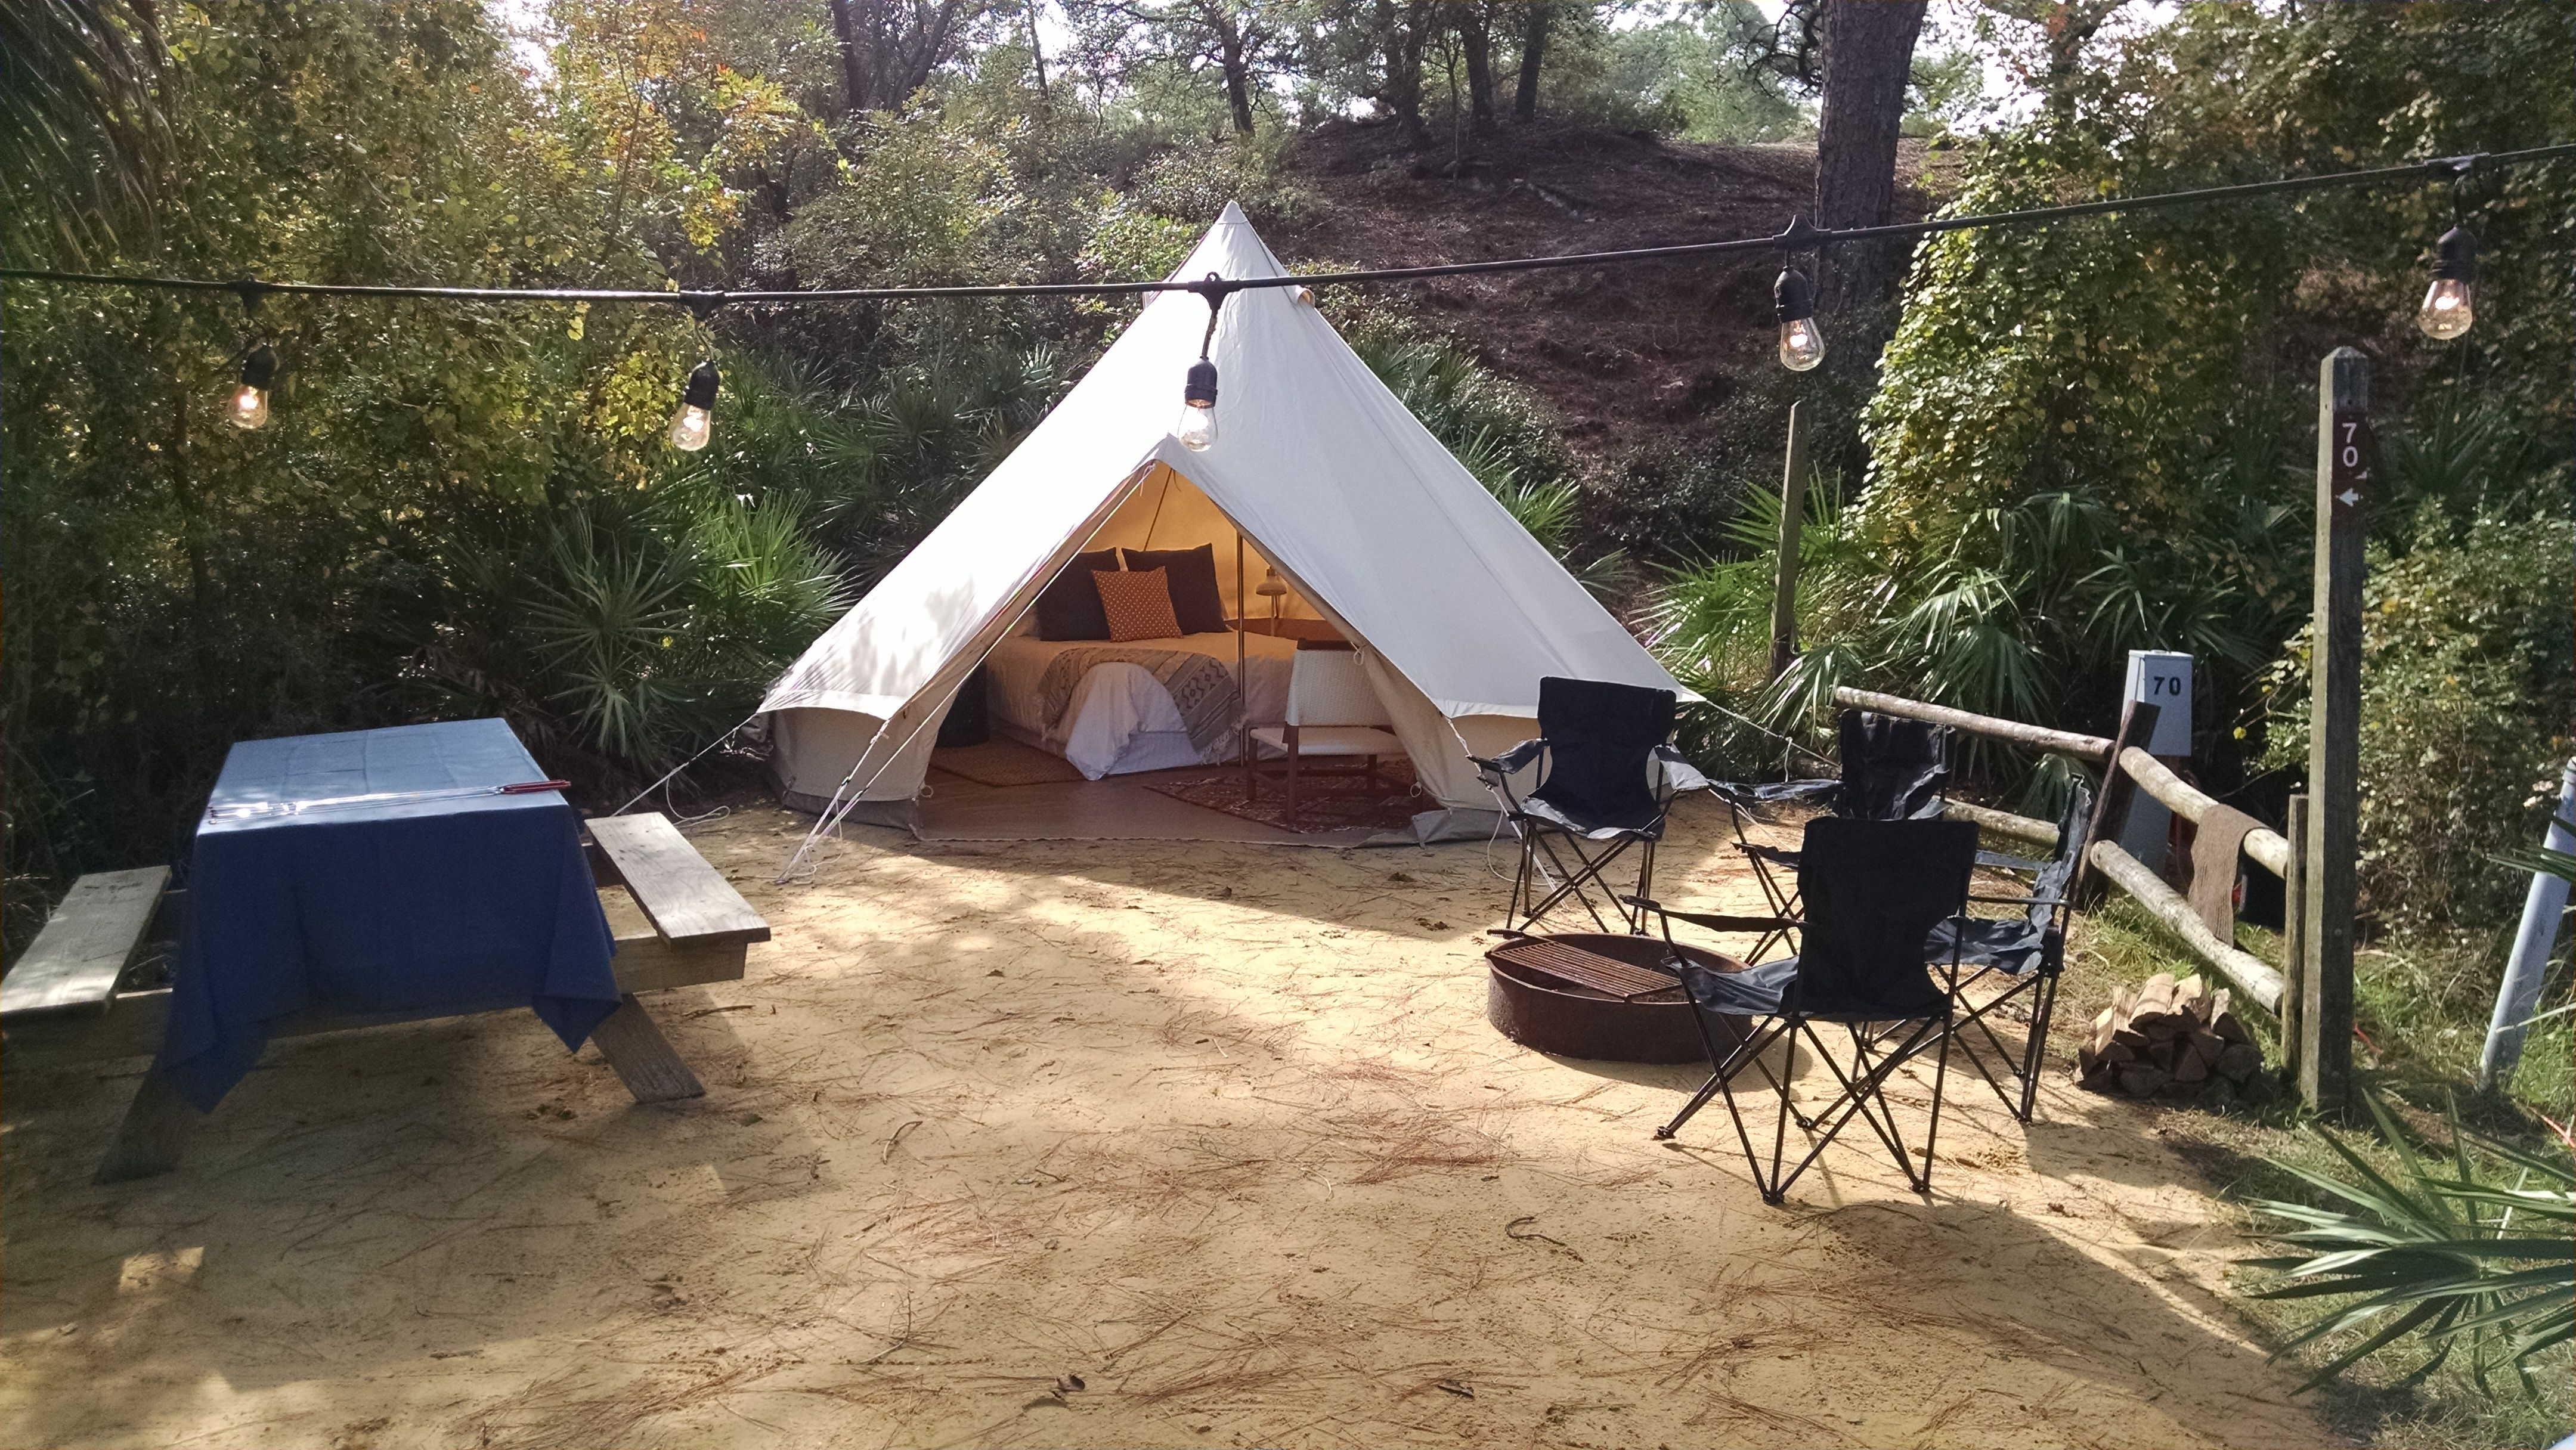 Glamping near Panama City Beach | Grayton beach state park, Luxury camping,  Glamping spots